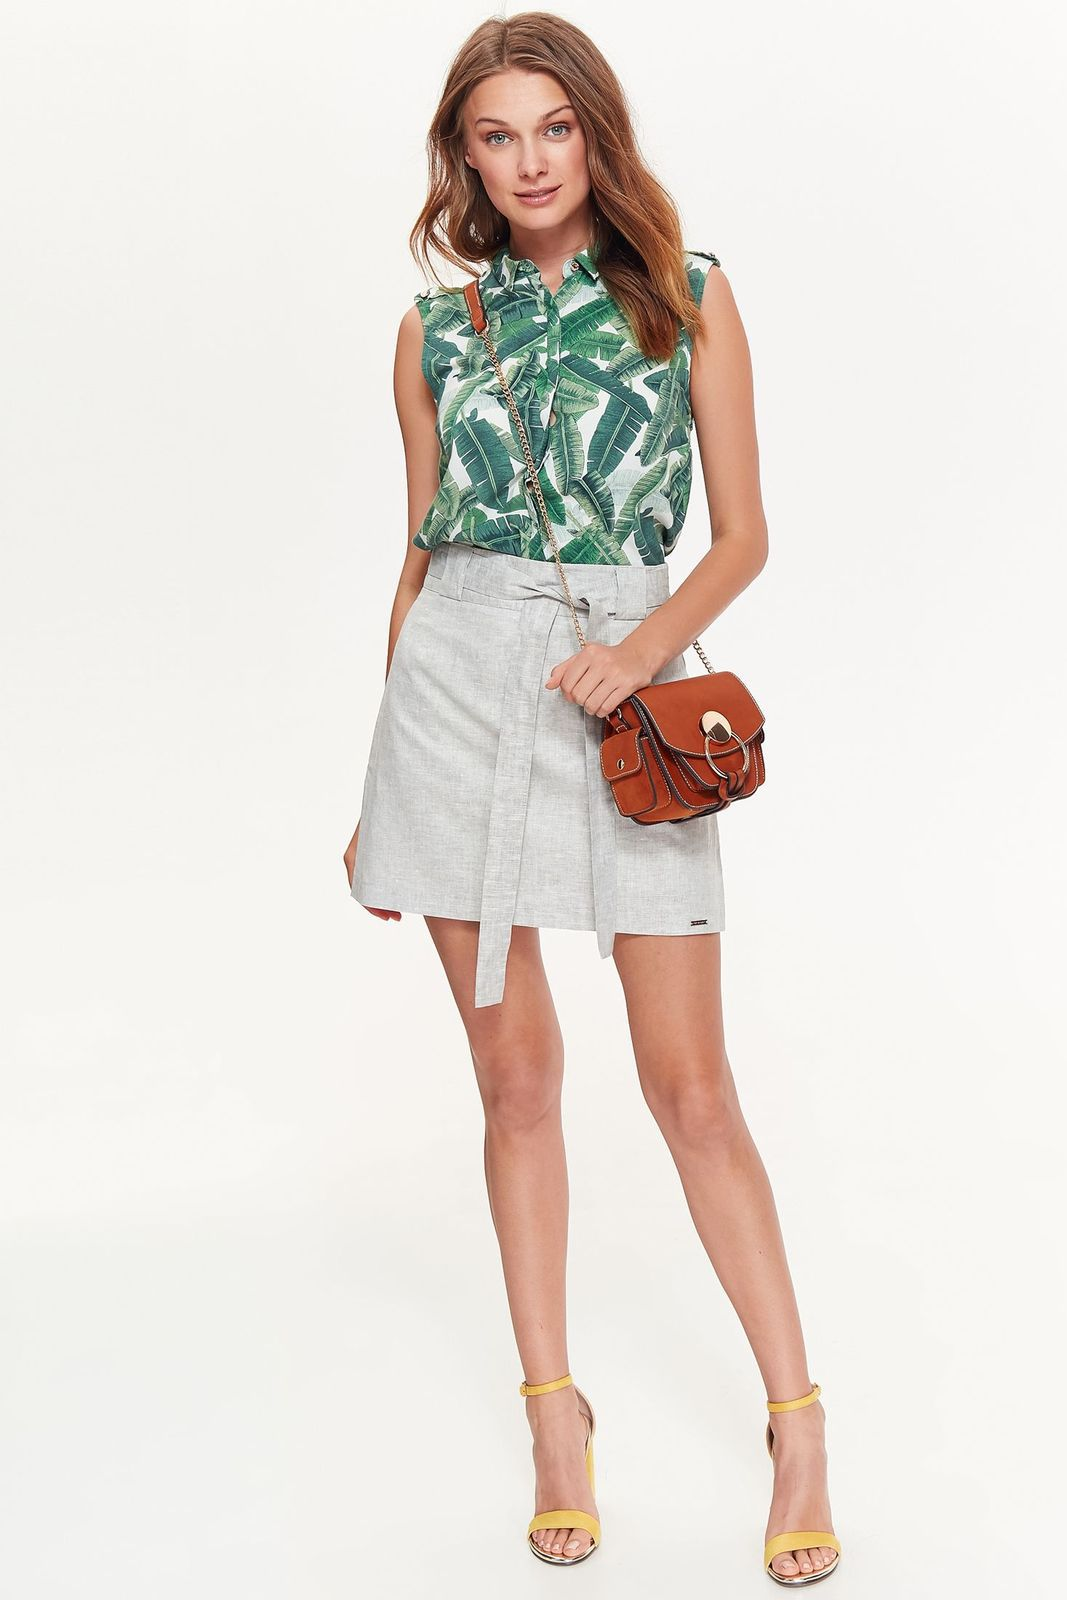 Camasa dama Top Secret verde casual cu croi larg fara maneci din material subtire cu print